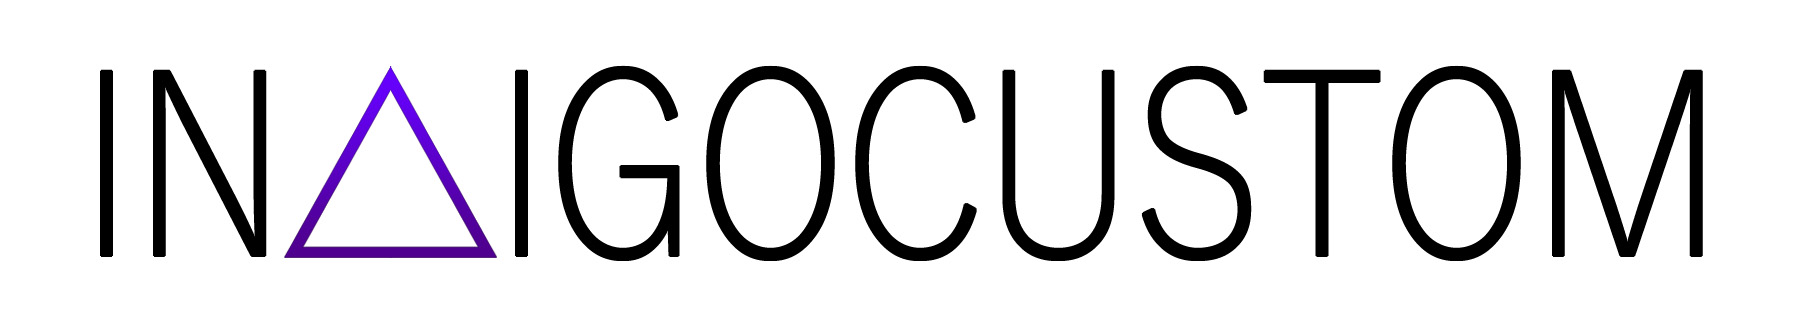 Indigo Custom, г. Орнебург ул, Пролетарская, 4, logo